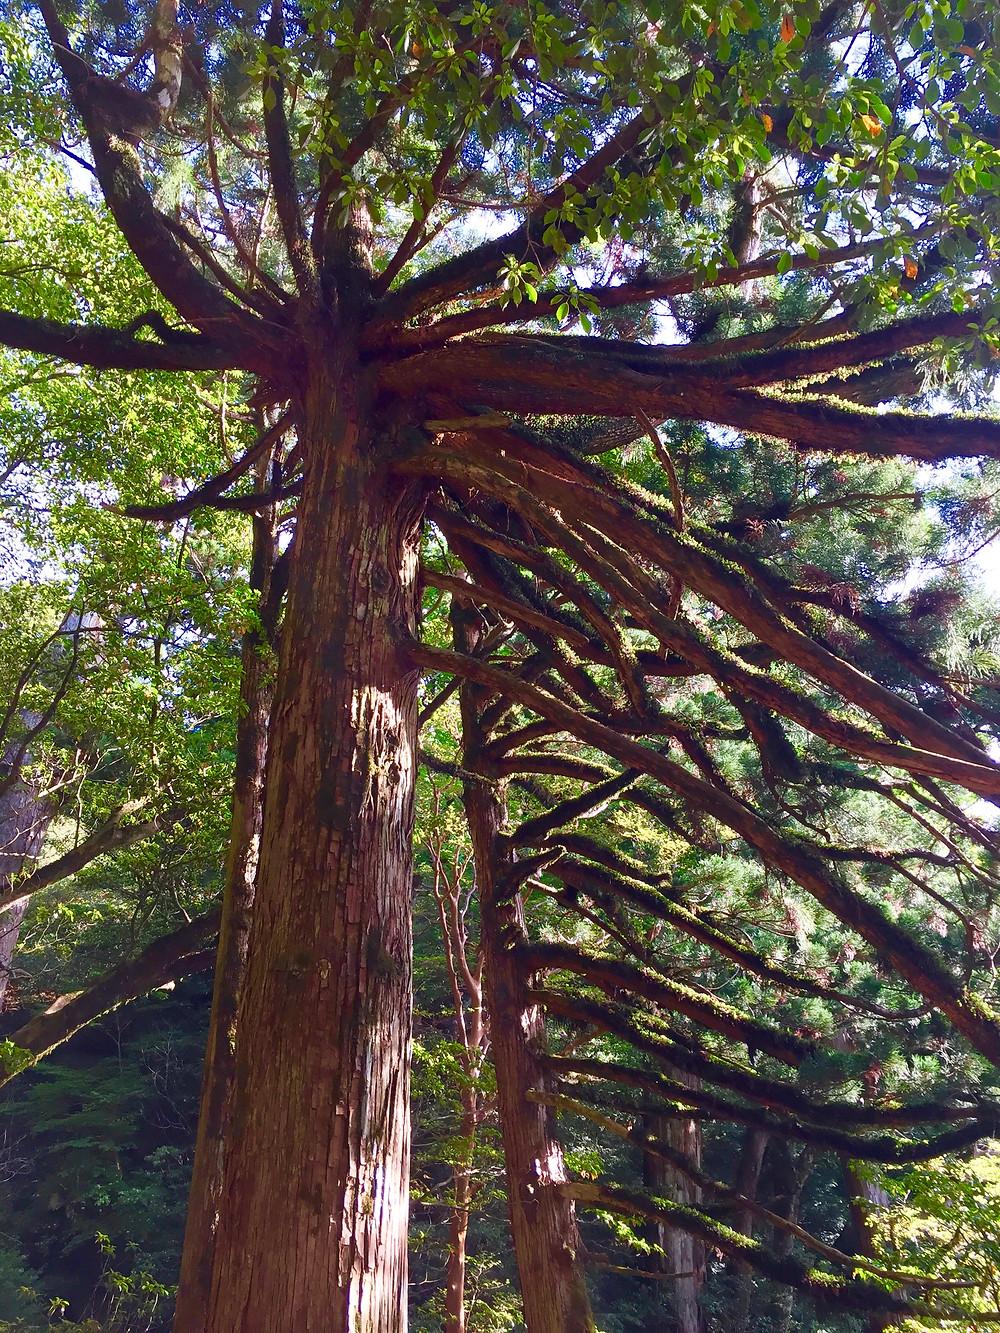 The Tarantula Tree that I slept under.